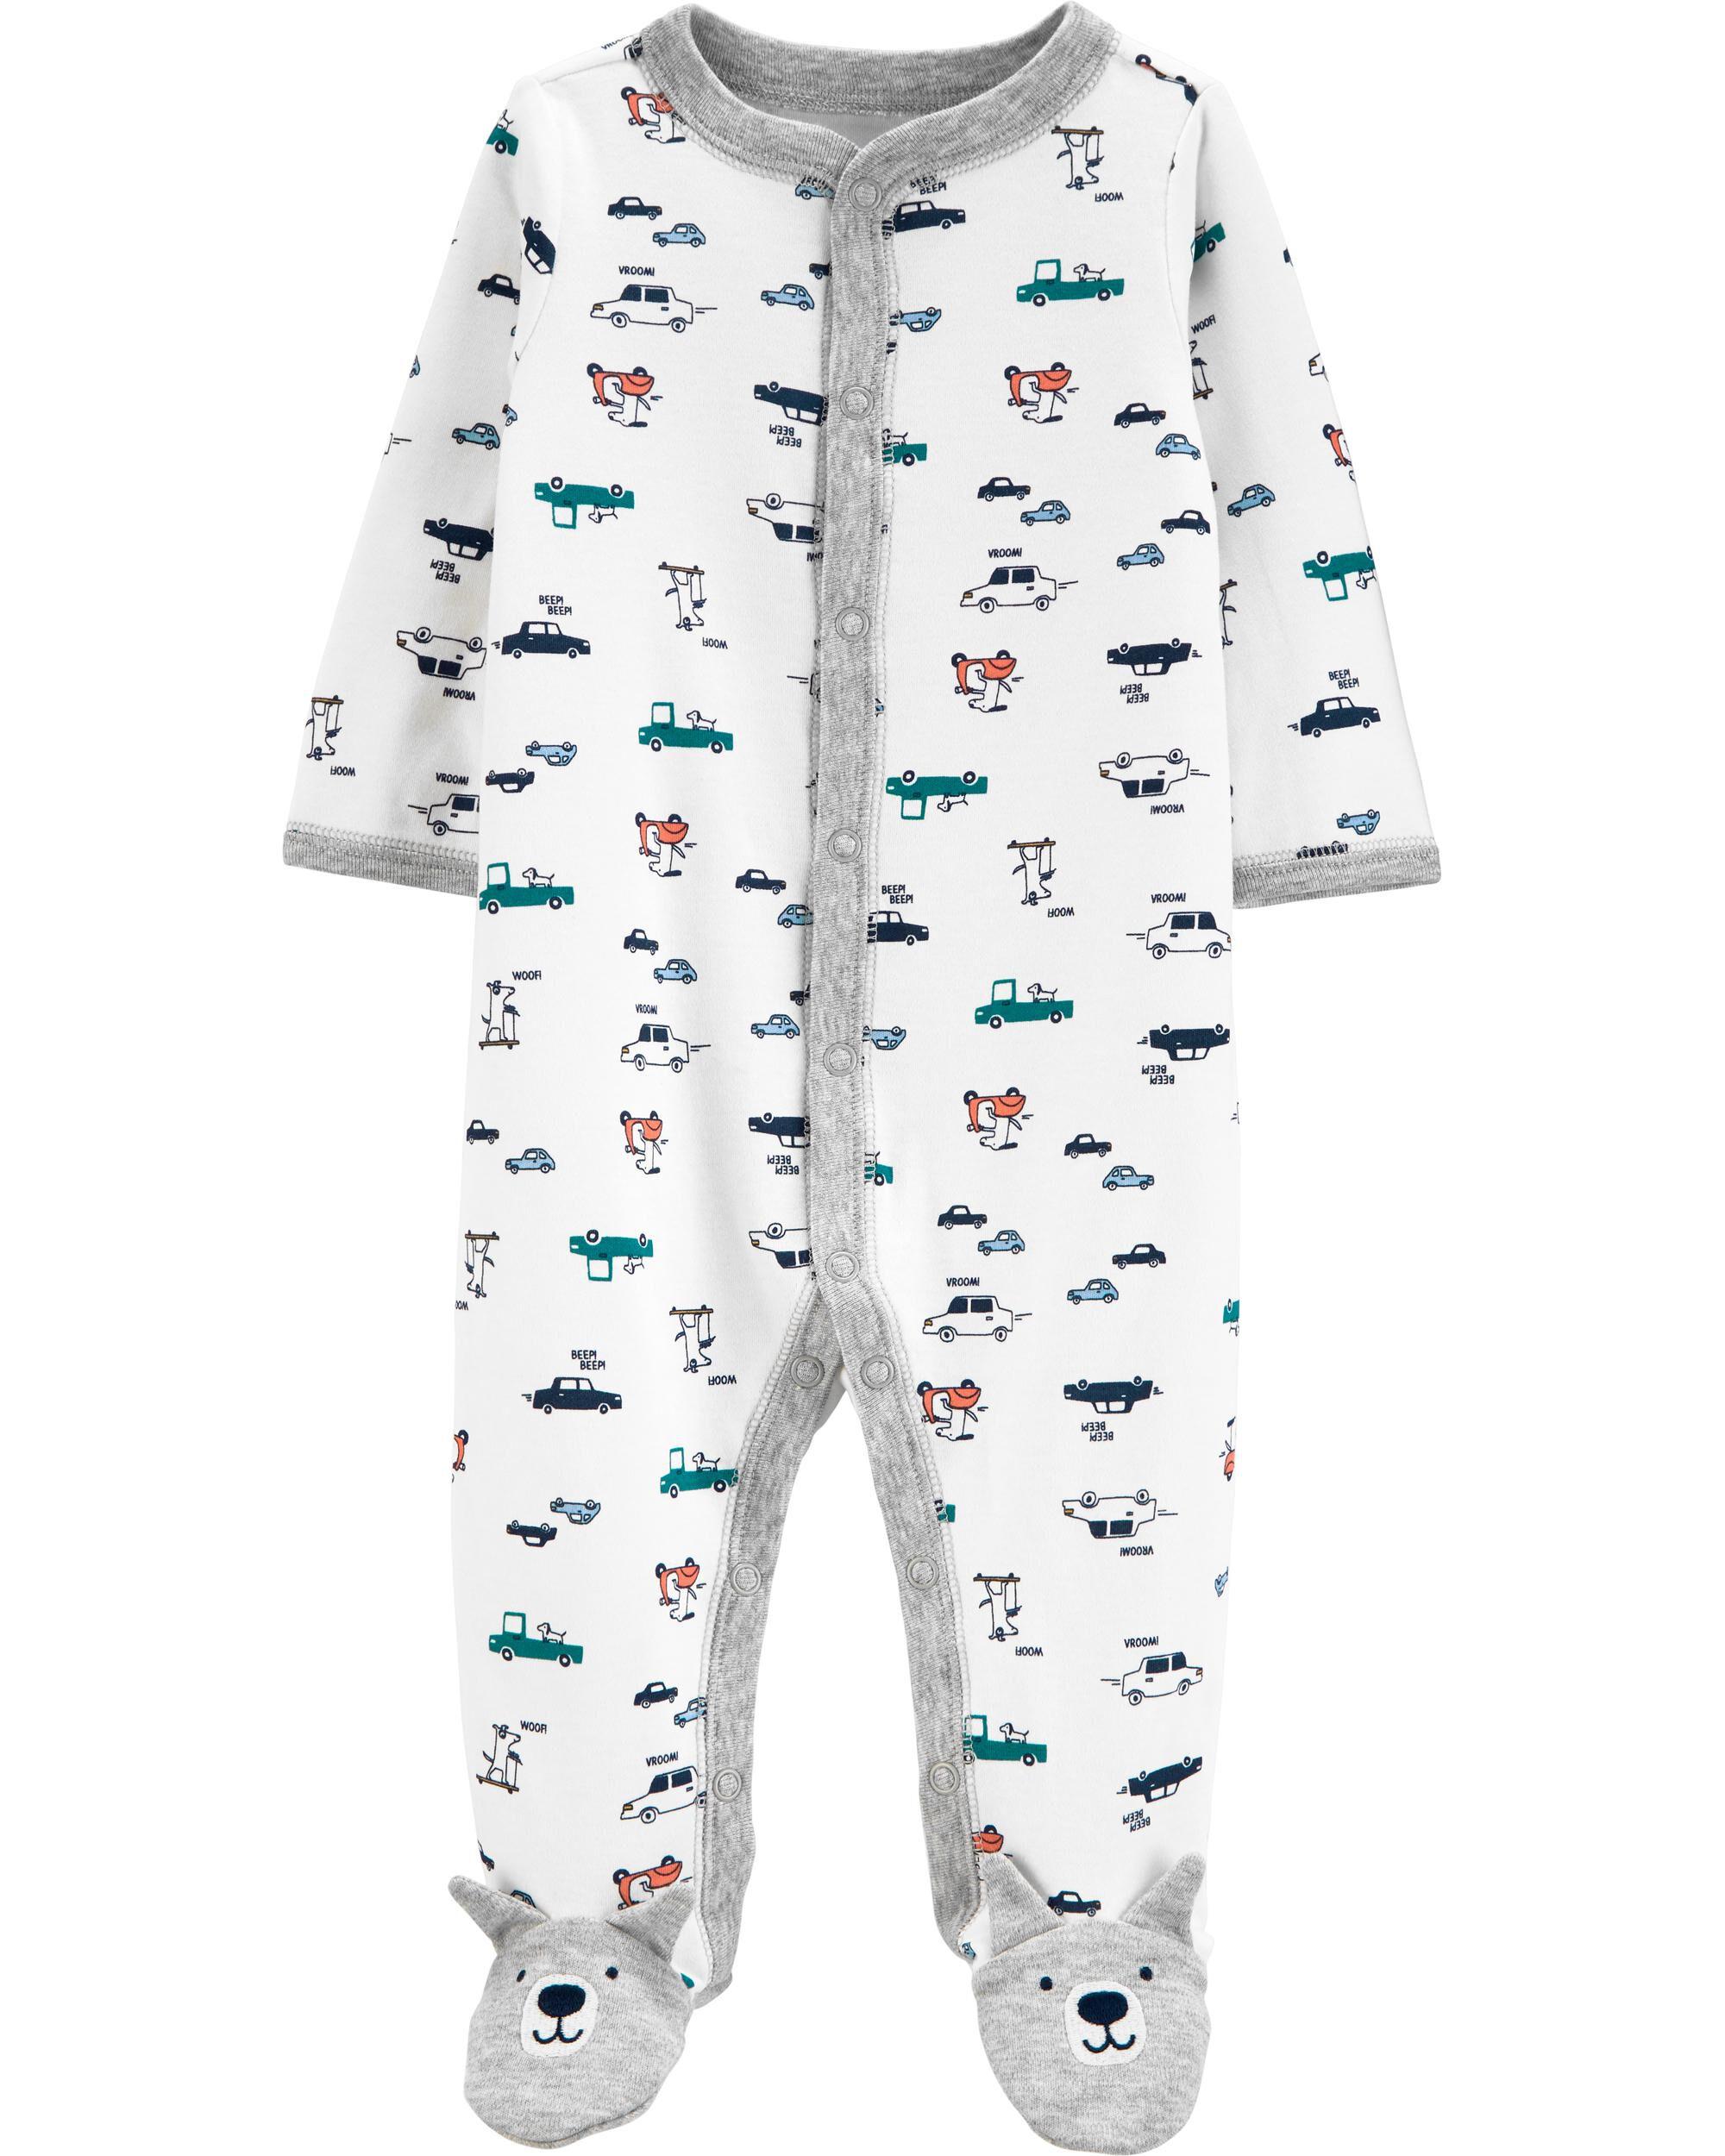 ts/_308683 3dRose Skye Elizabeth Designs Master Fisher Kingfisher Adult T-Shirt XL